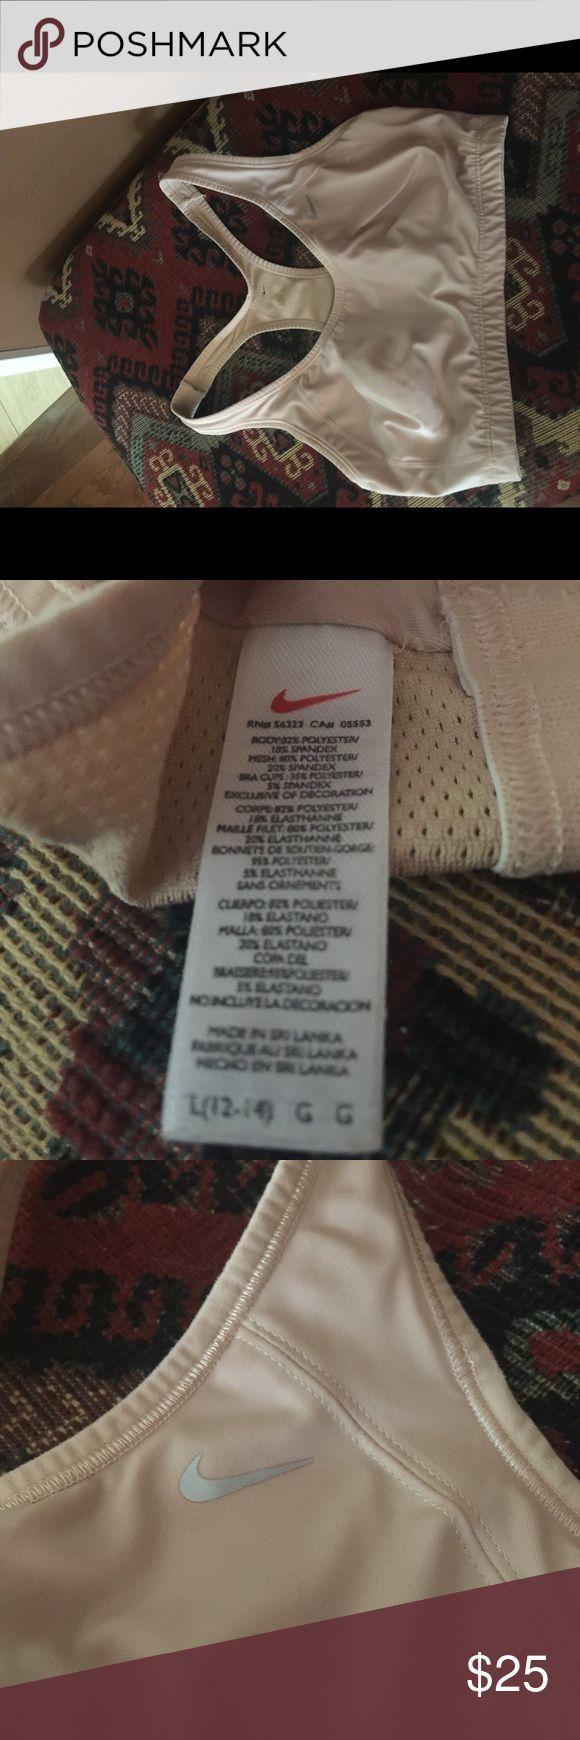 Nike nude sports bra Nike nude sports bra. Size Large. Nike Intimates & Sleepwear Bras